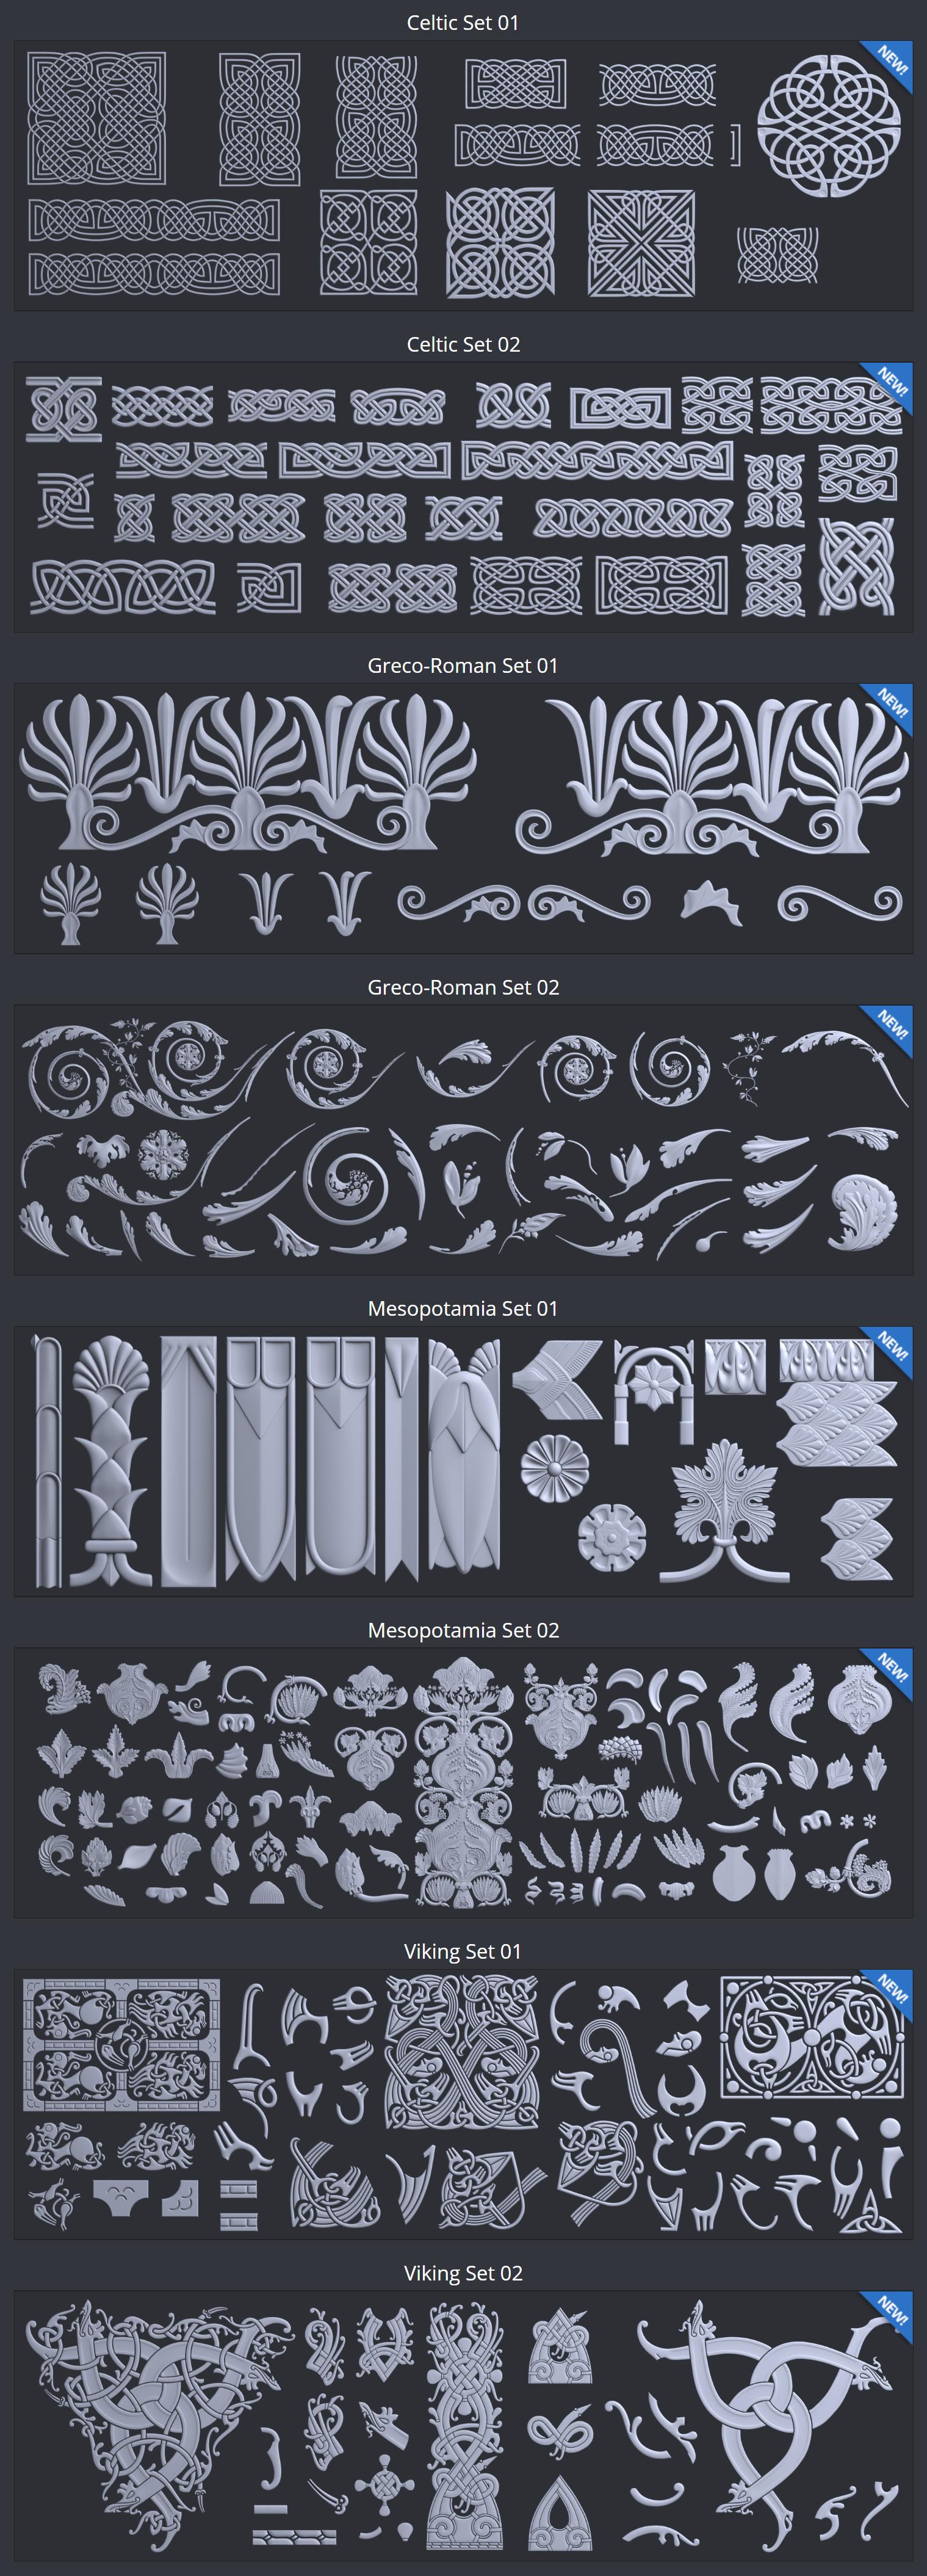 screencapture-textures-browse-3d-ornaments-114561-2019-02-14-18_57_04.png